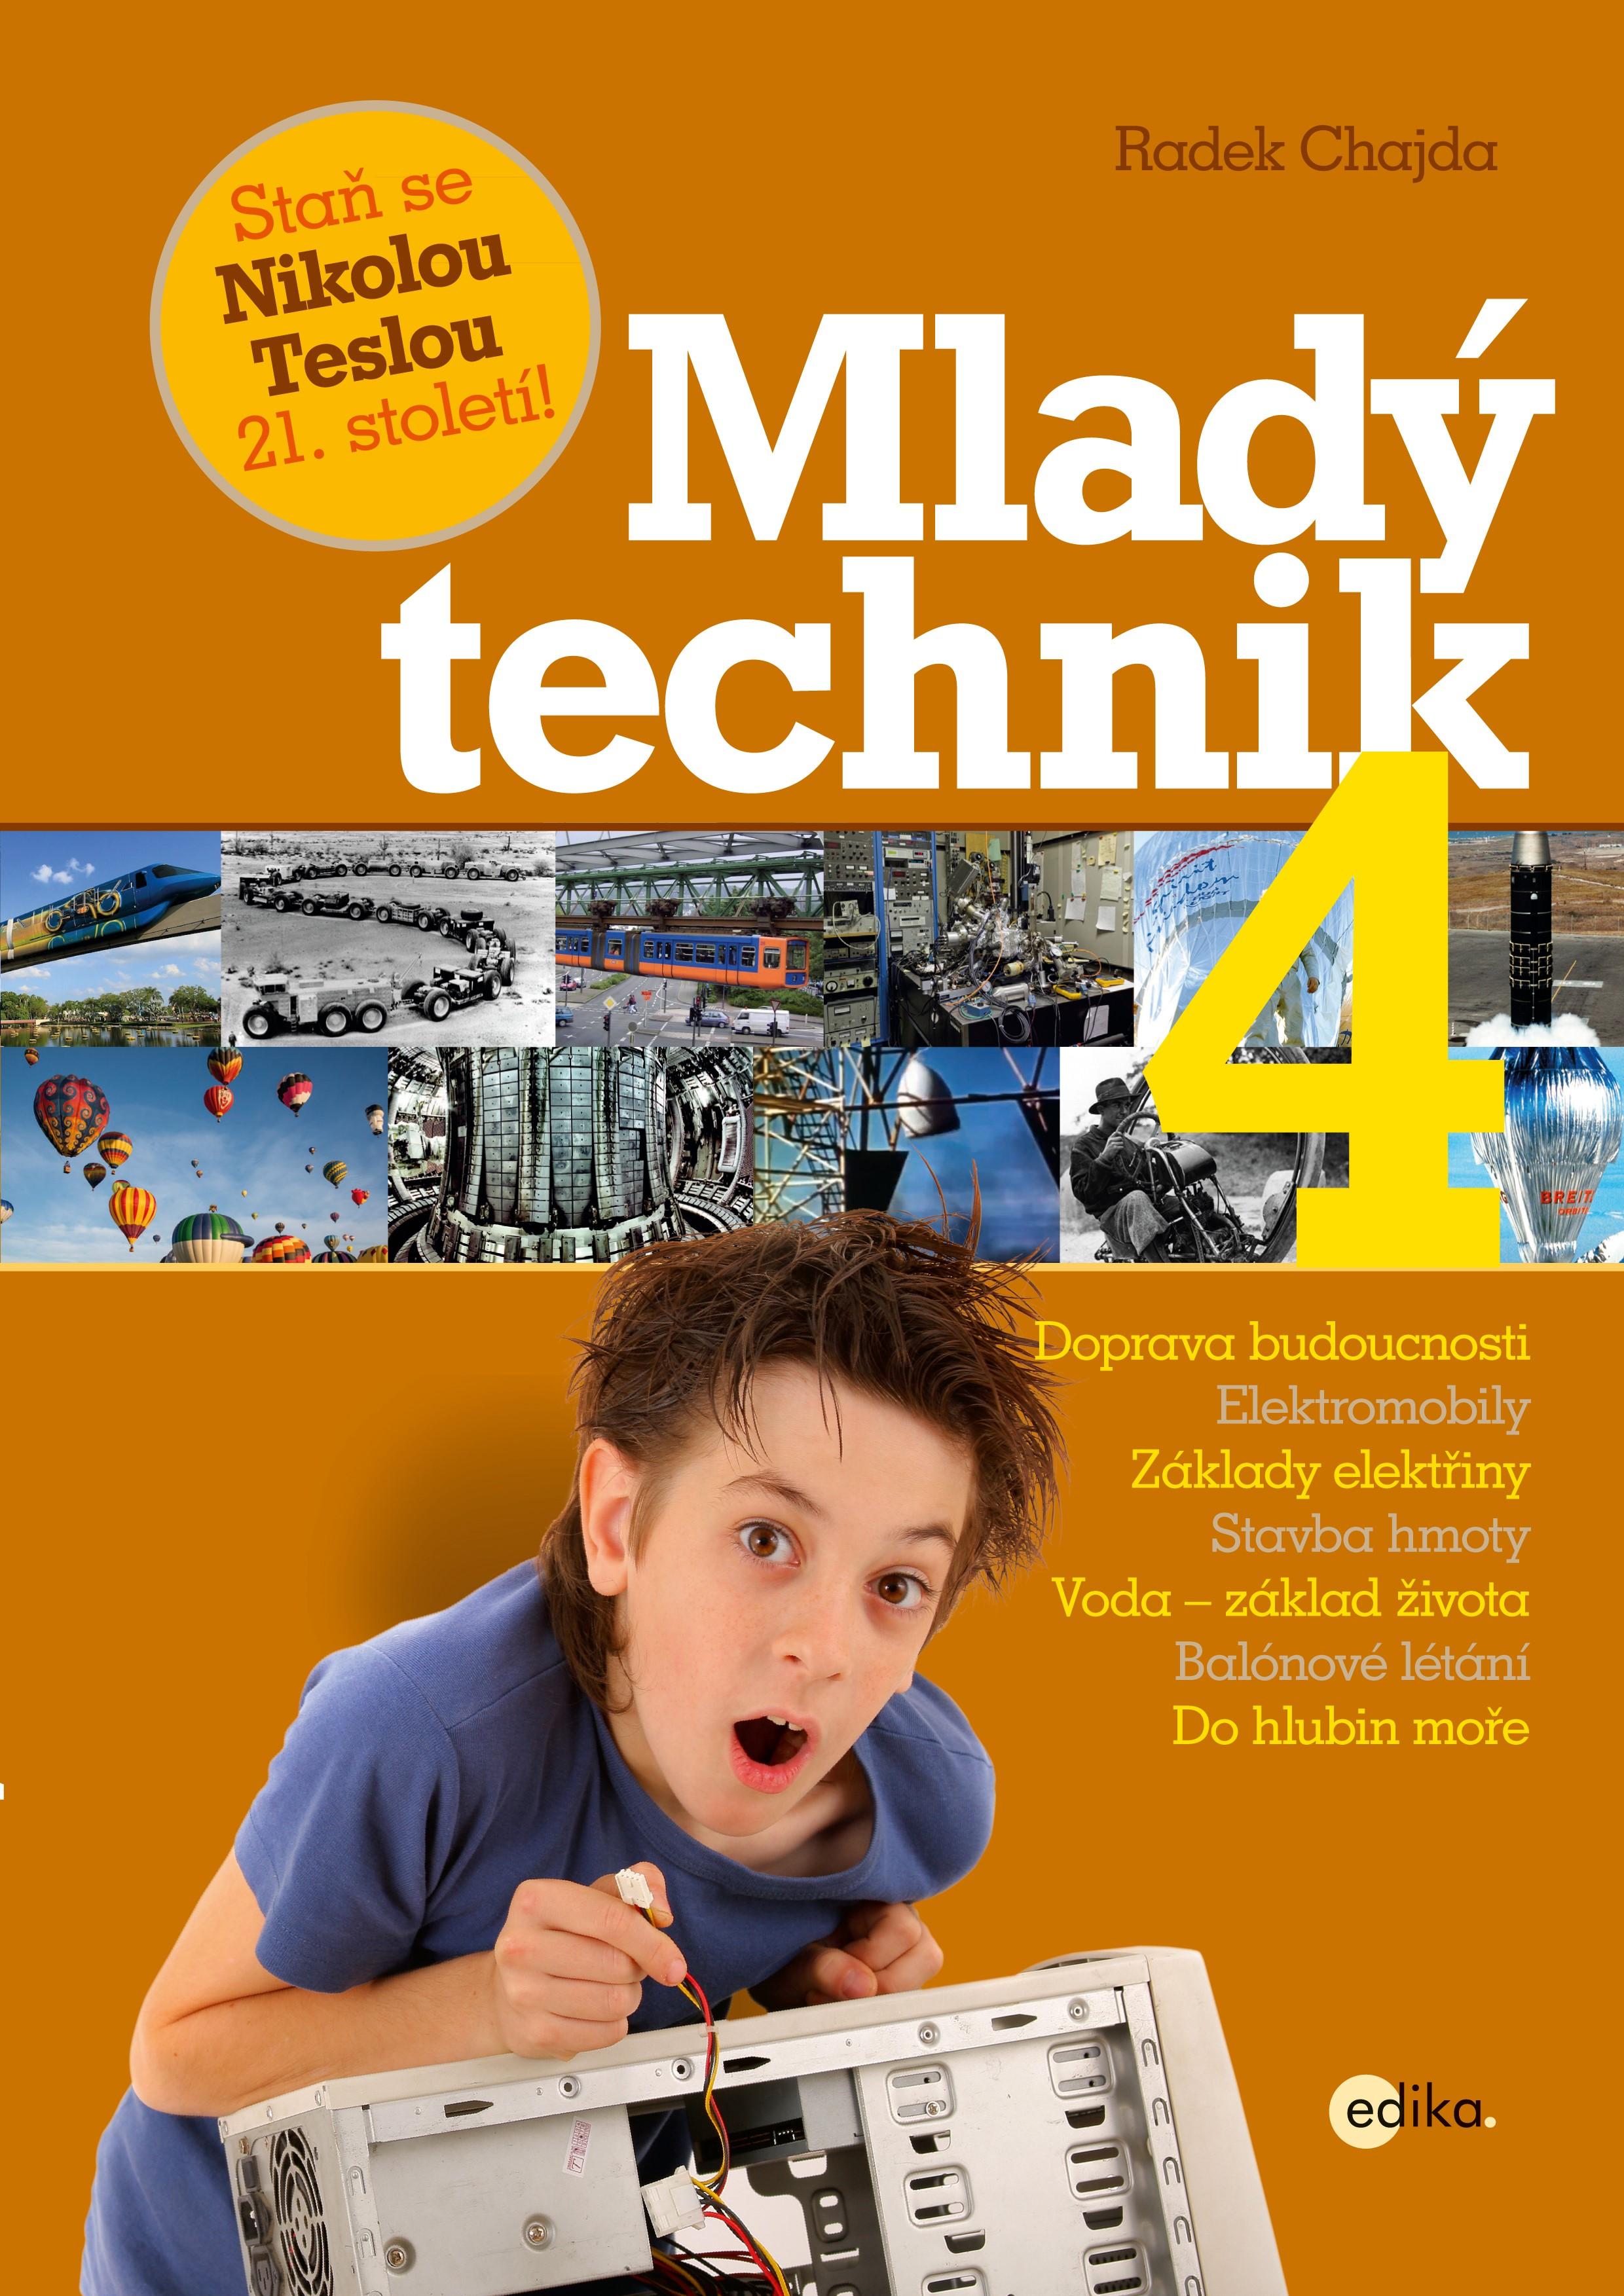 Mladý technik 4 | Radek Chajda